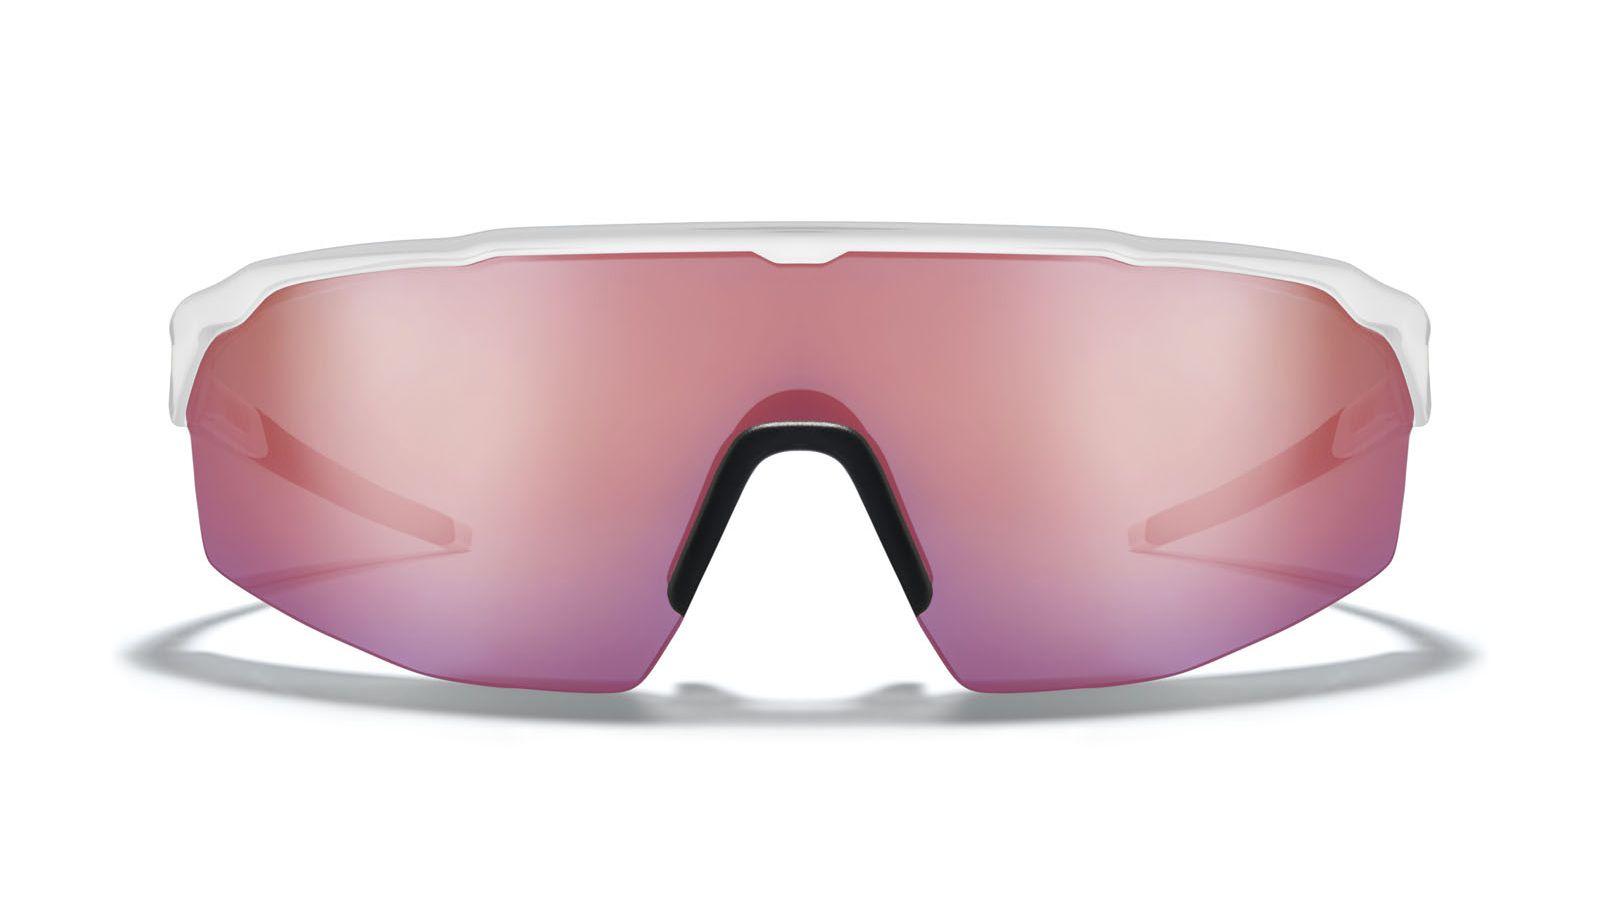 4fb0b6db531e SR Series Men's & Women's Cycling Glasses   ROKA